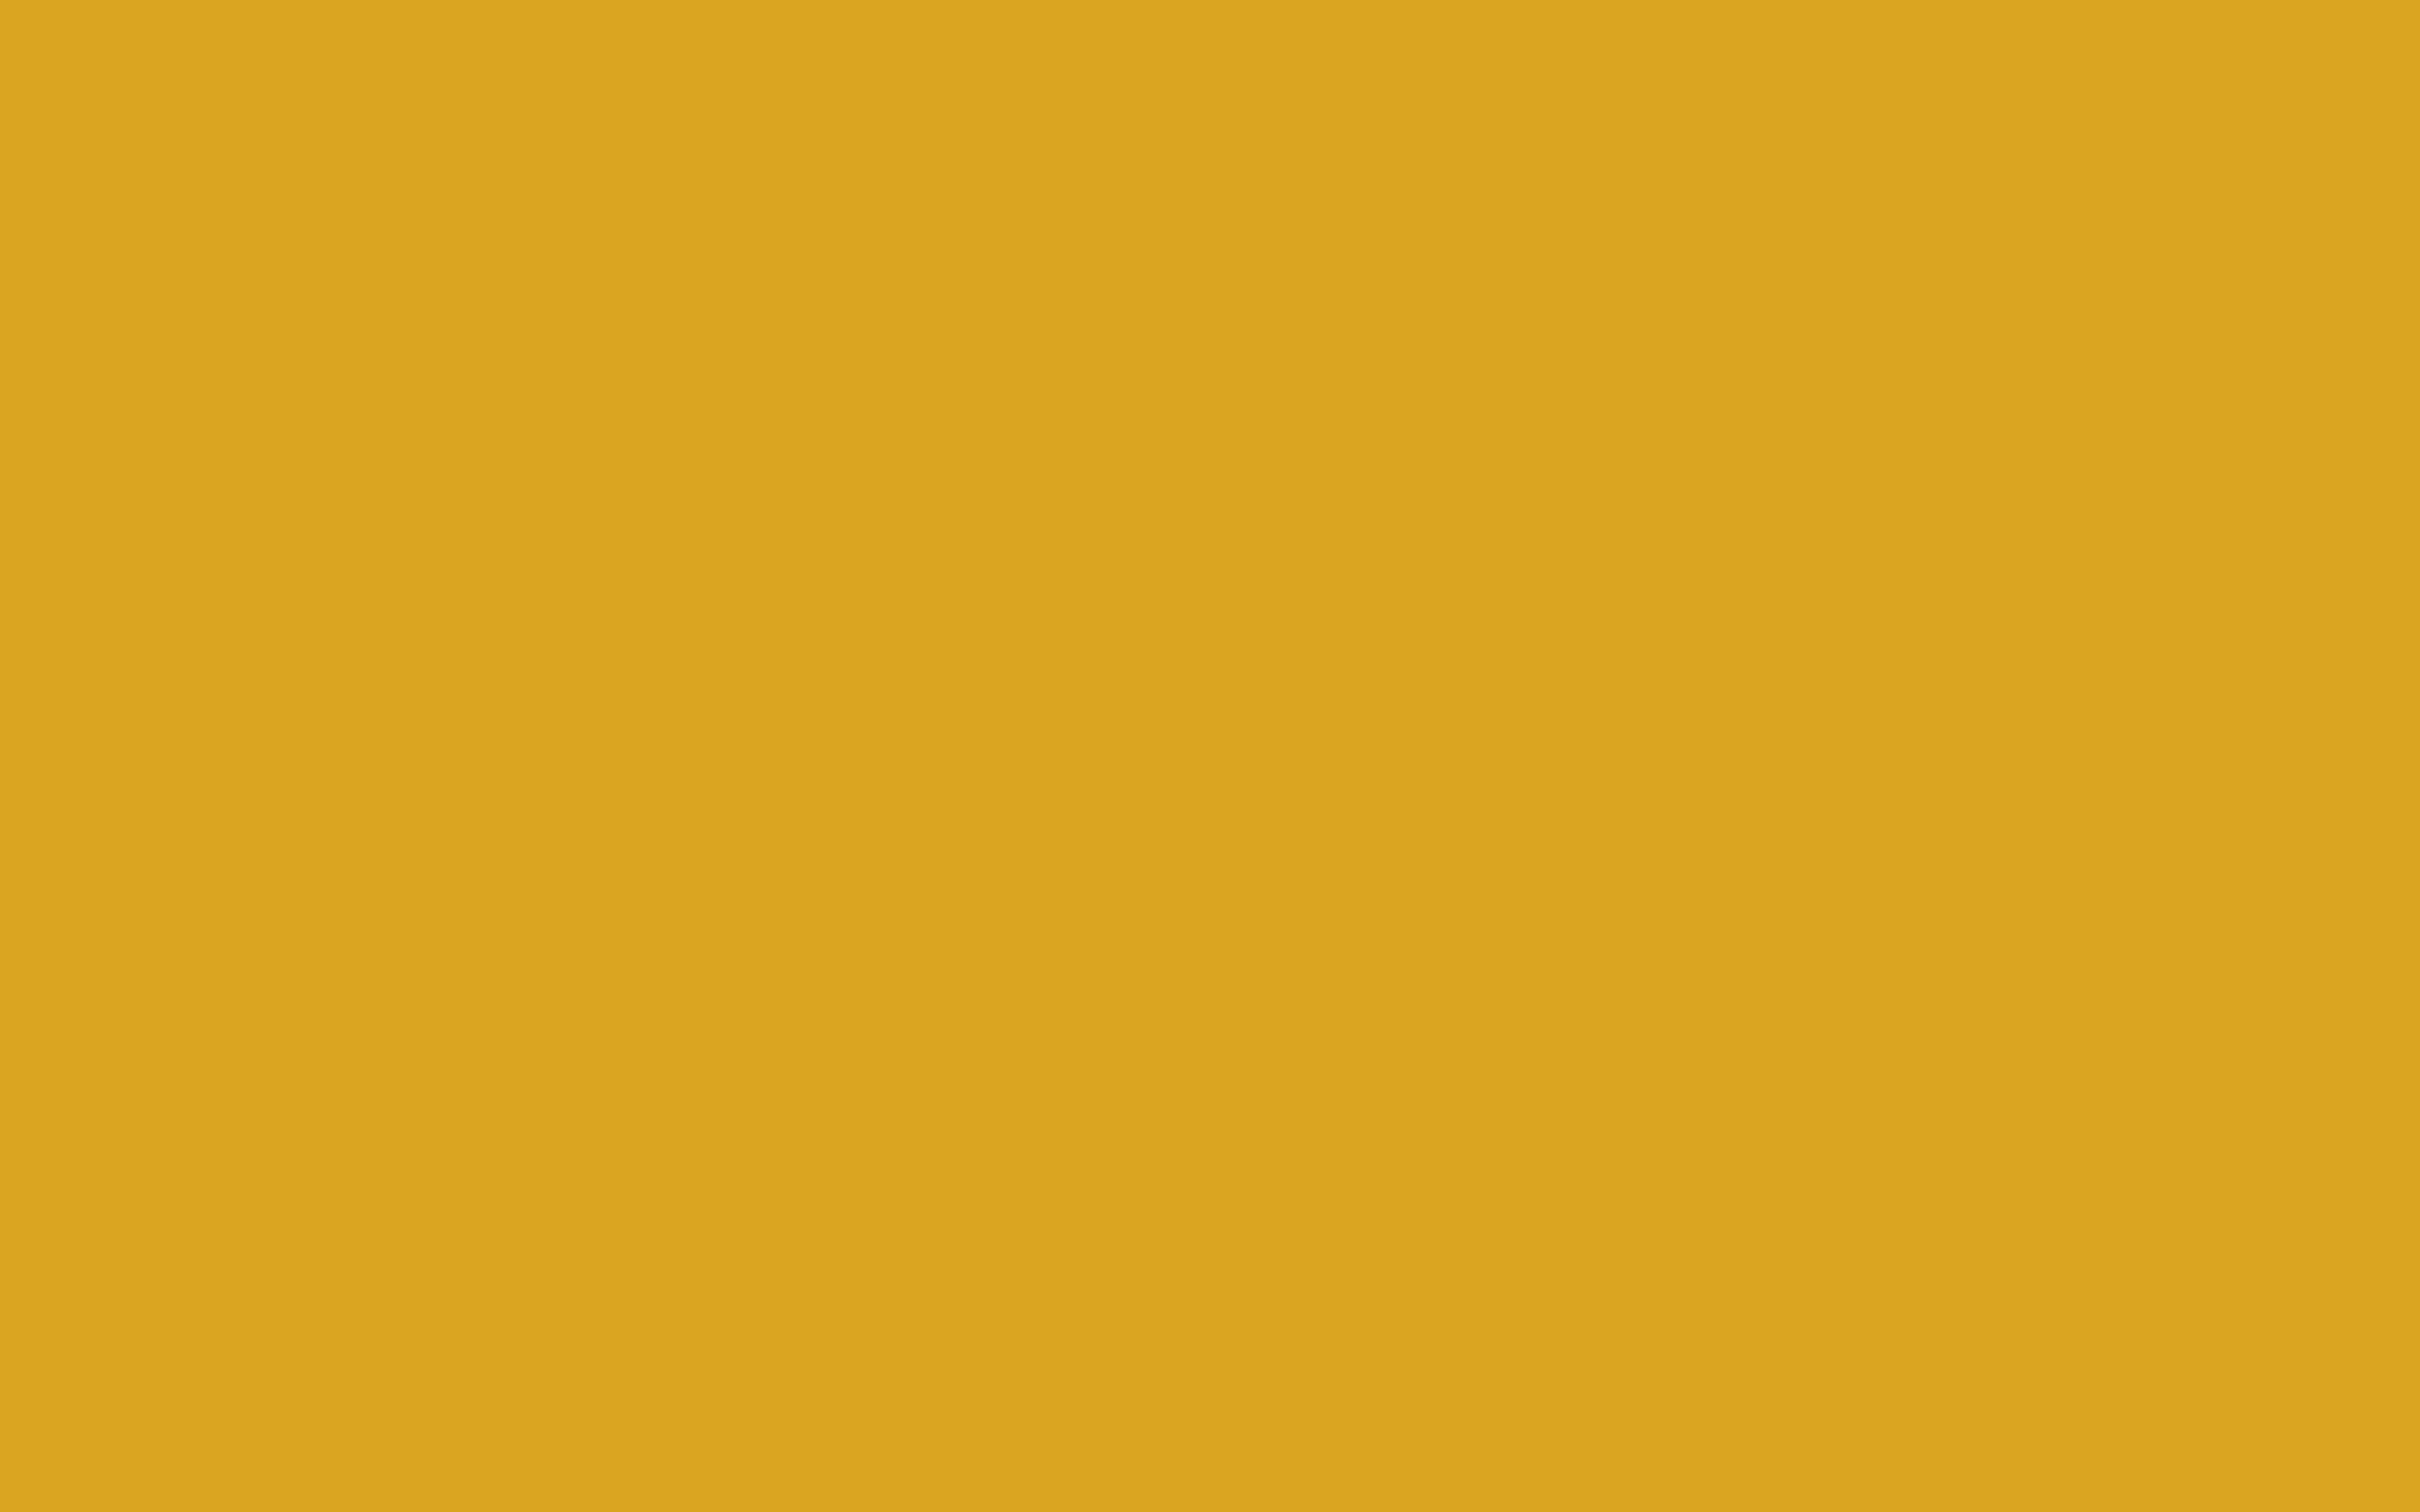 2560x1600 Goldenrod Solid Color Background